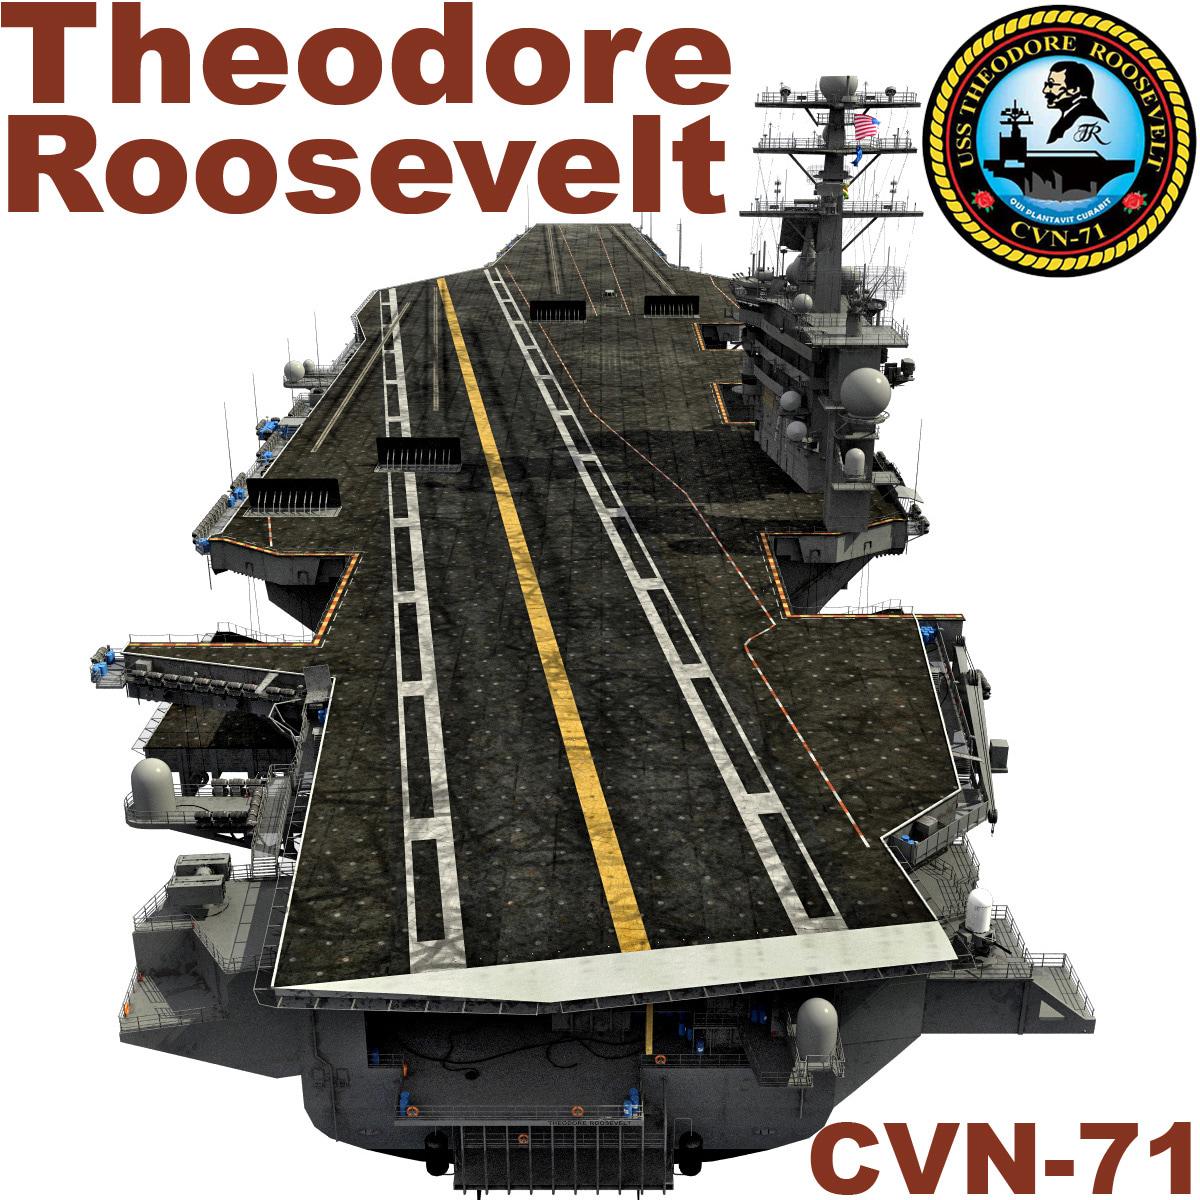 USS_Theodore_Roosevelt_CVN-71_00.jpg